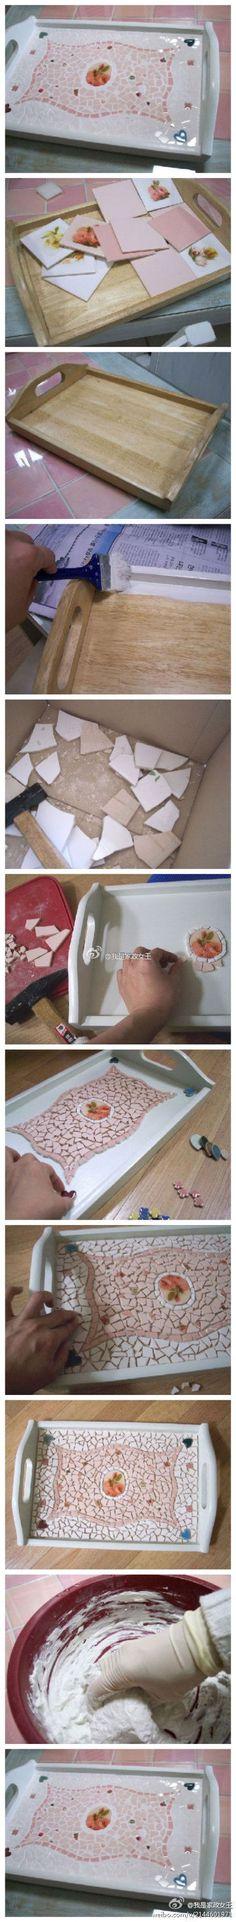 DIY Mosaic Tiles Tray DIY Projects